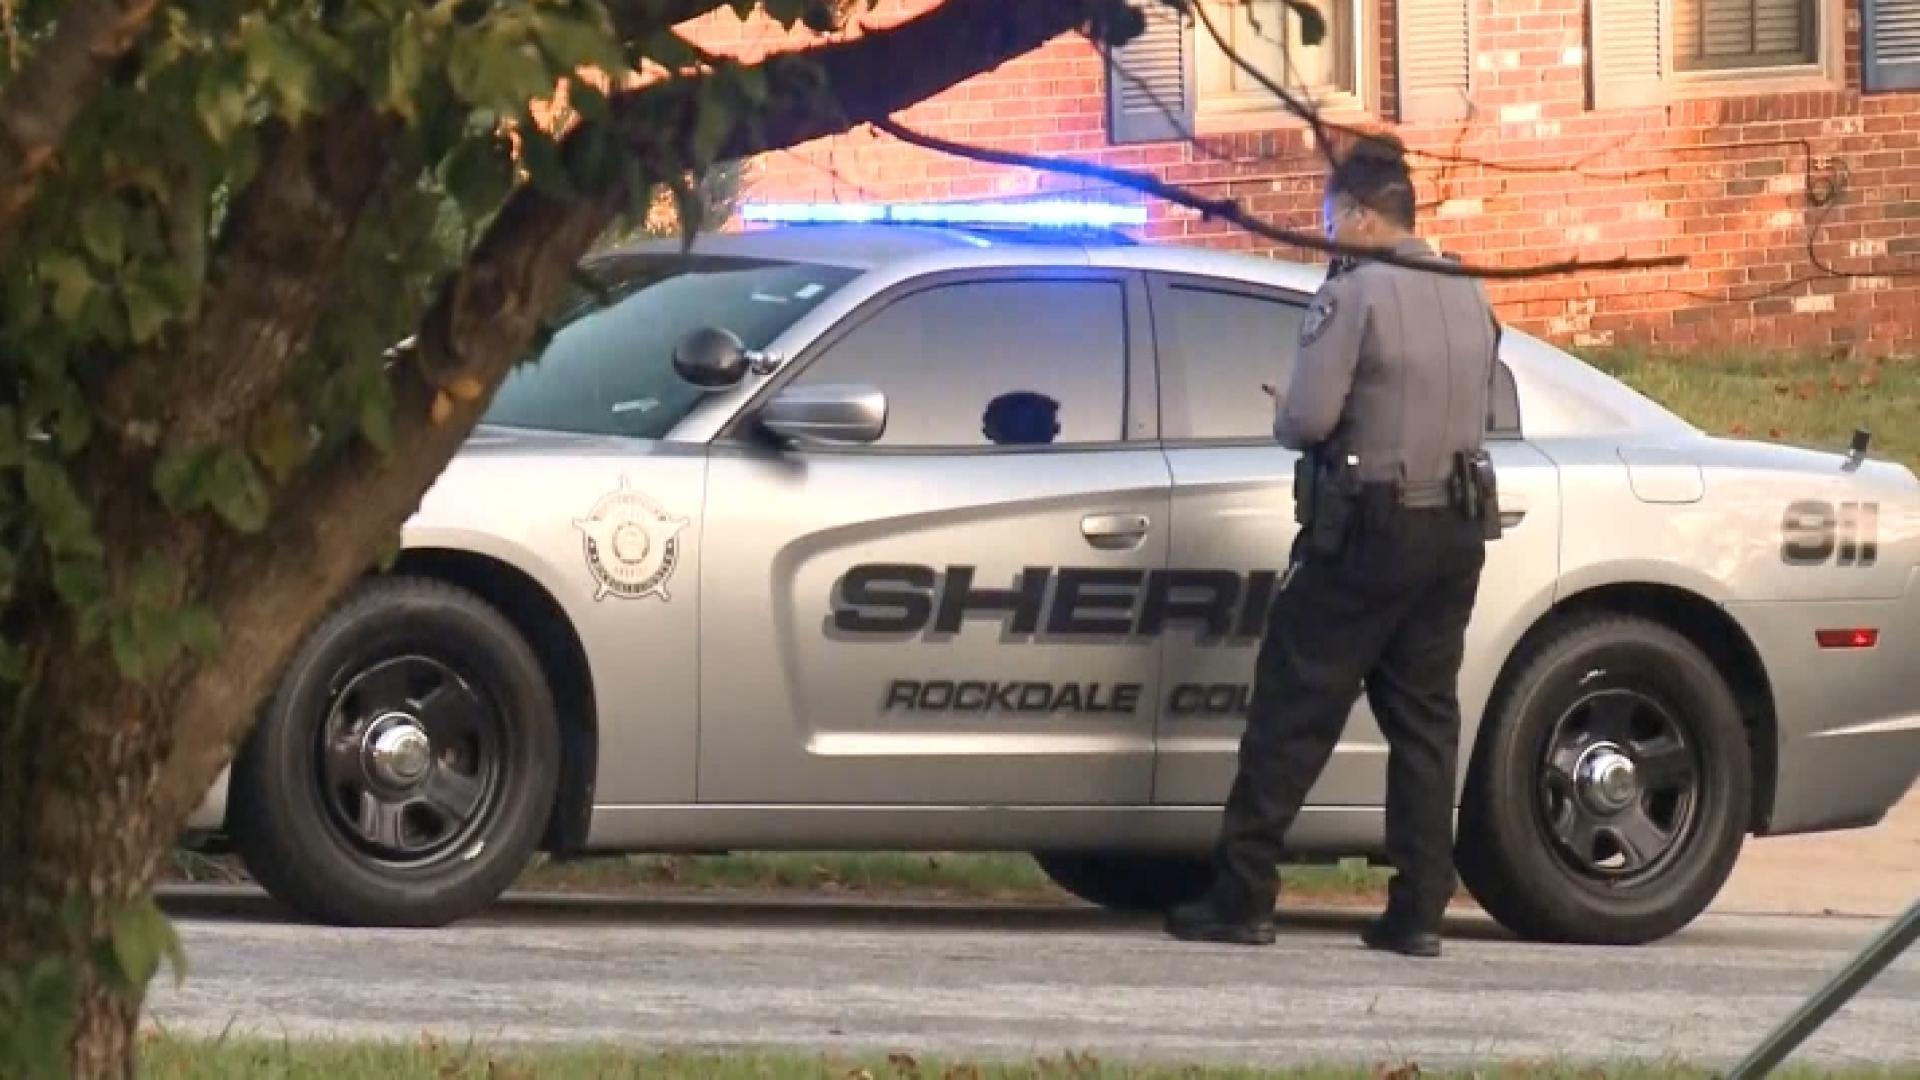 Three masked teens gunned down during failed home burglary near Atlanta